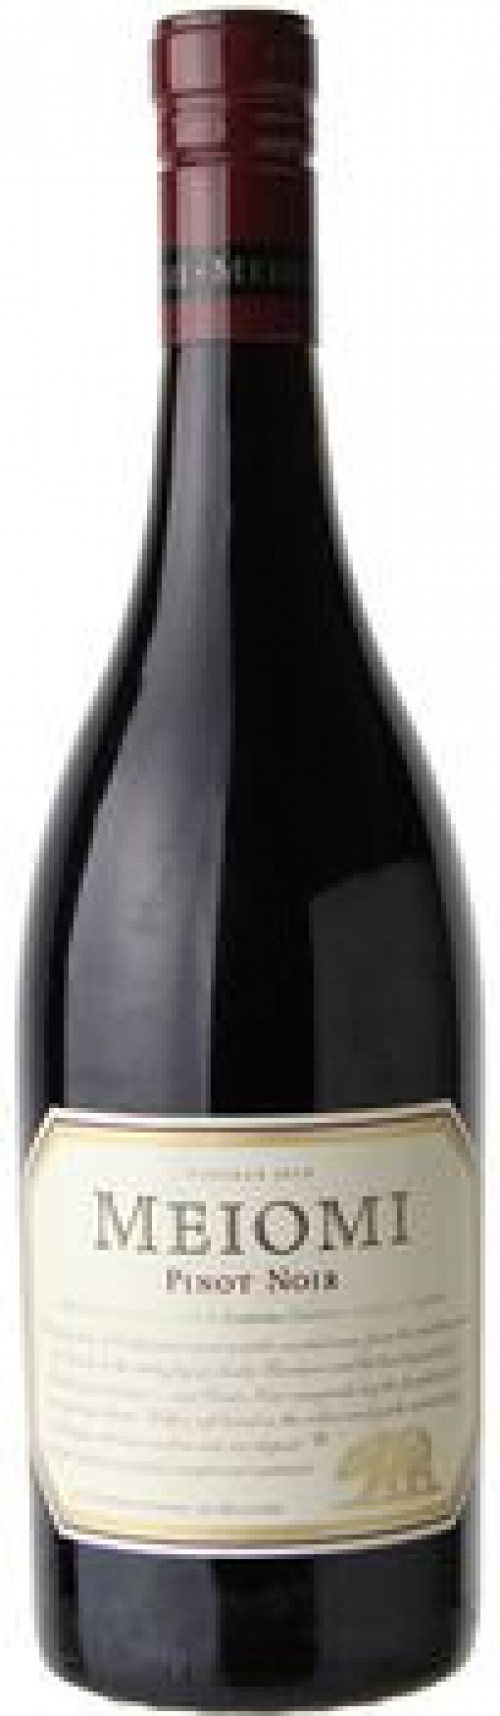 Meiomi Pinot Noir 750ml